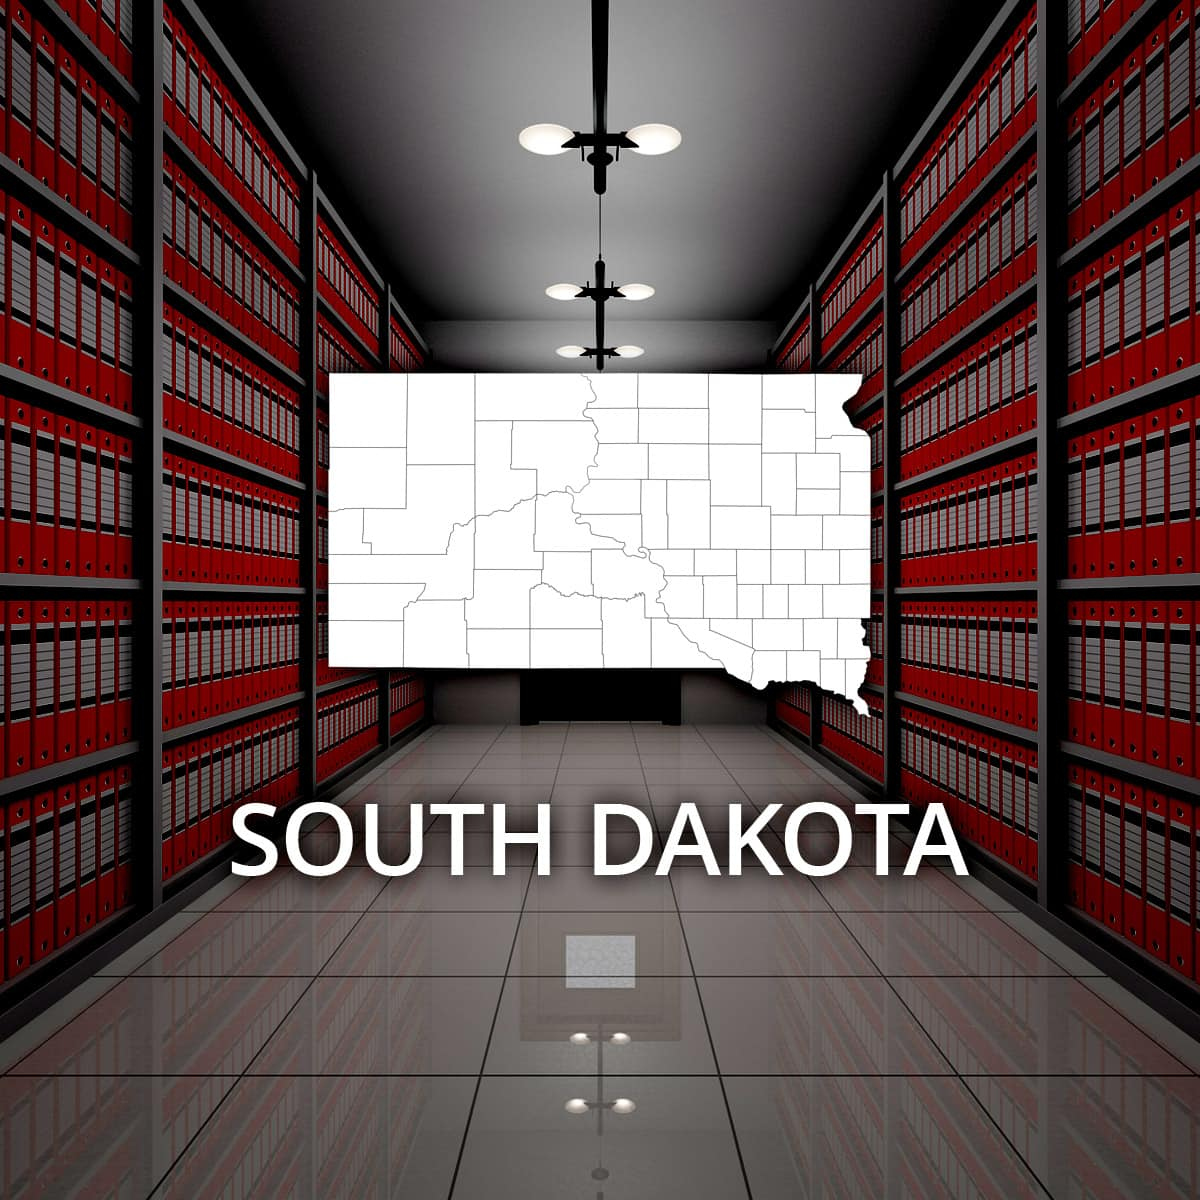 South Dakota Public Records